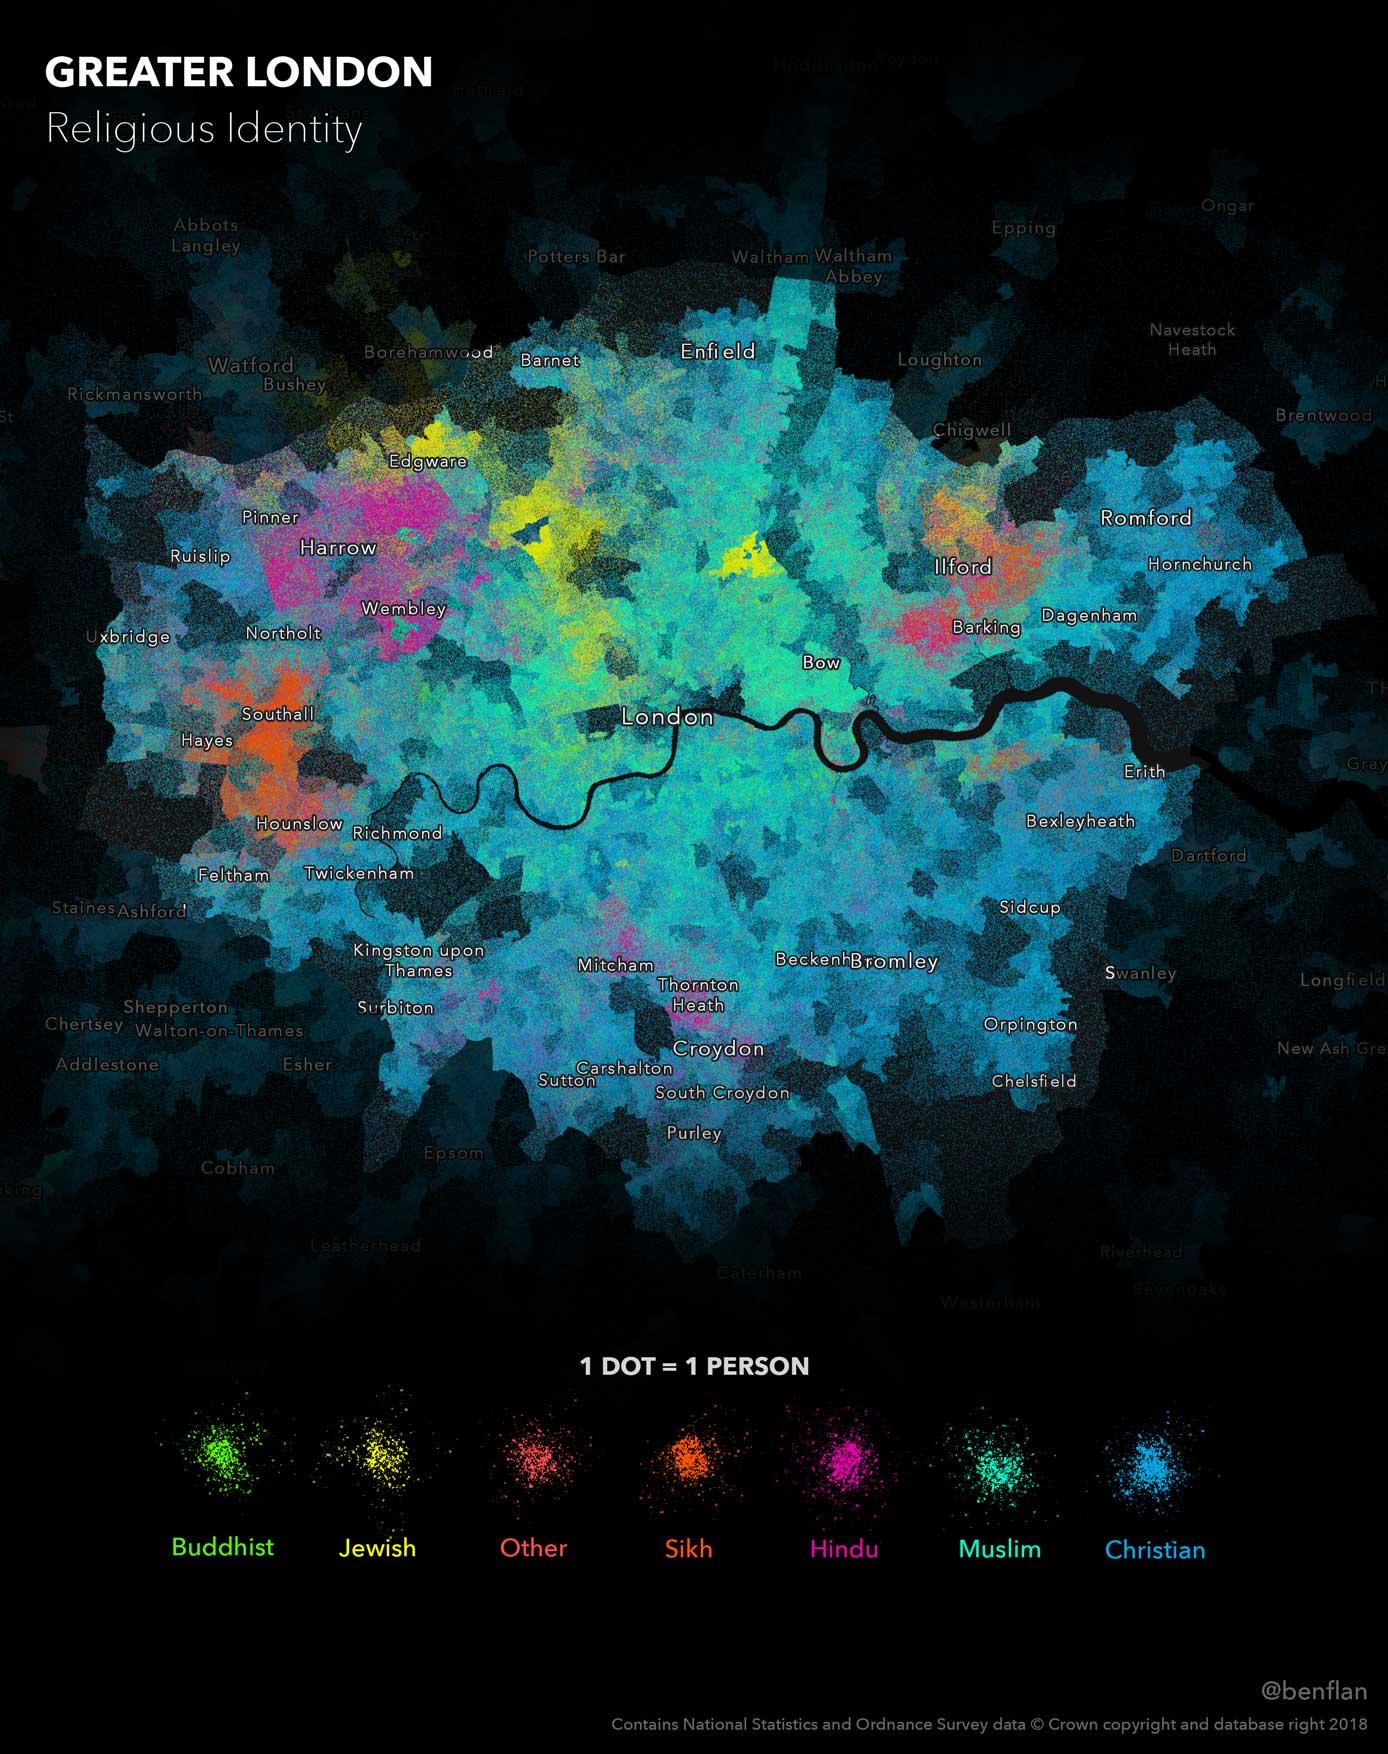 Religious identity across Greater London